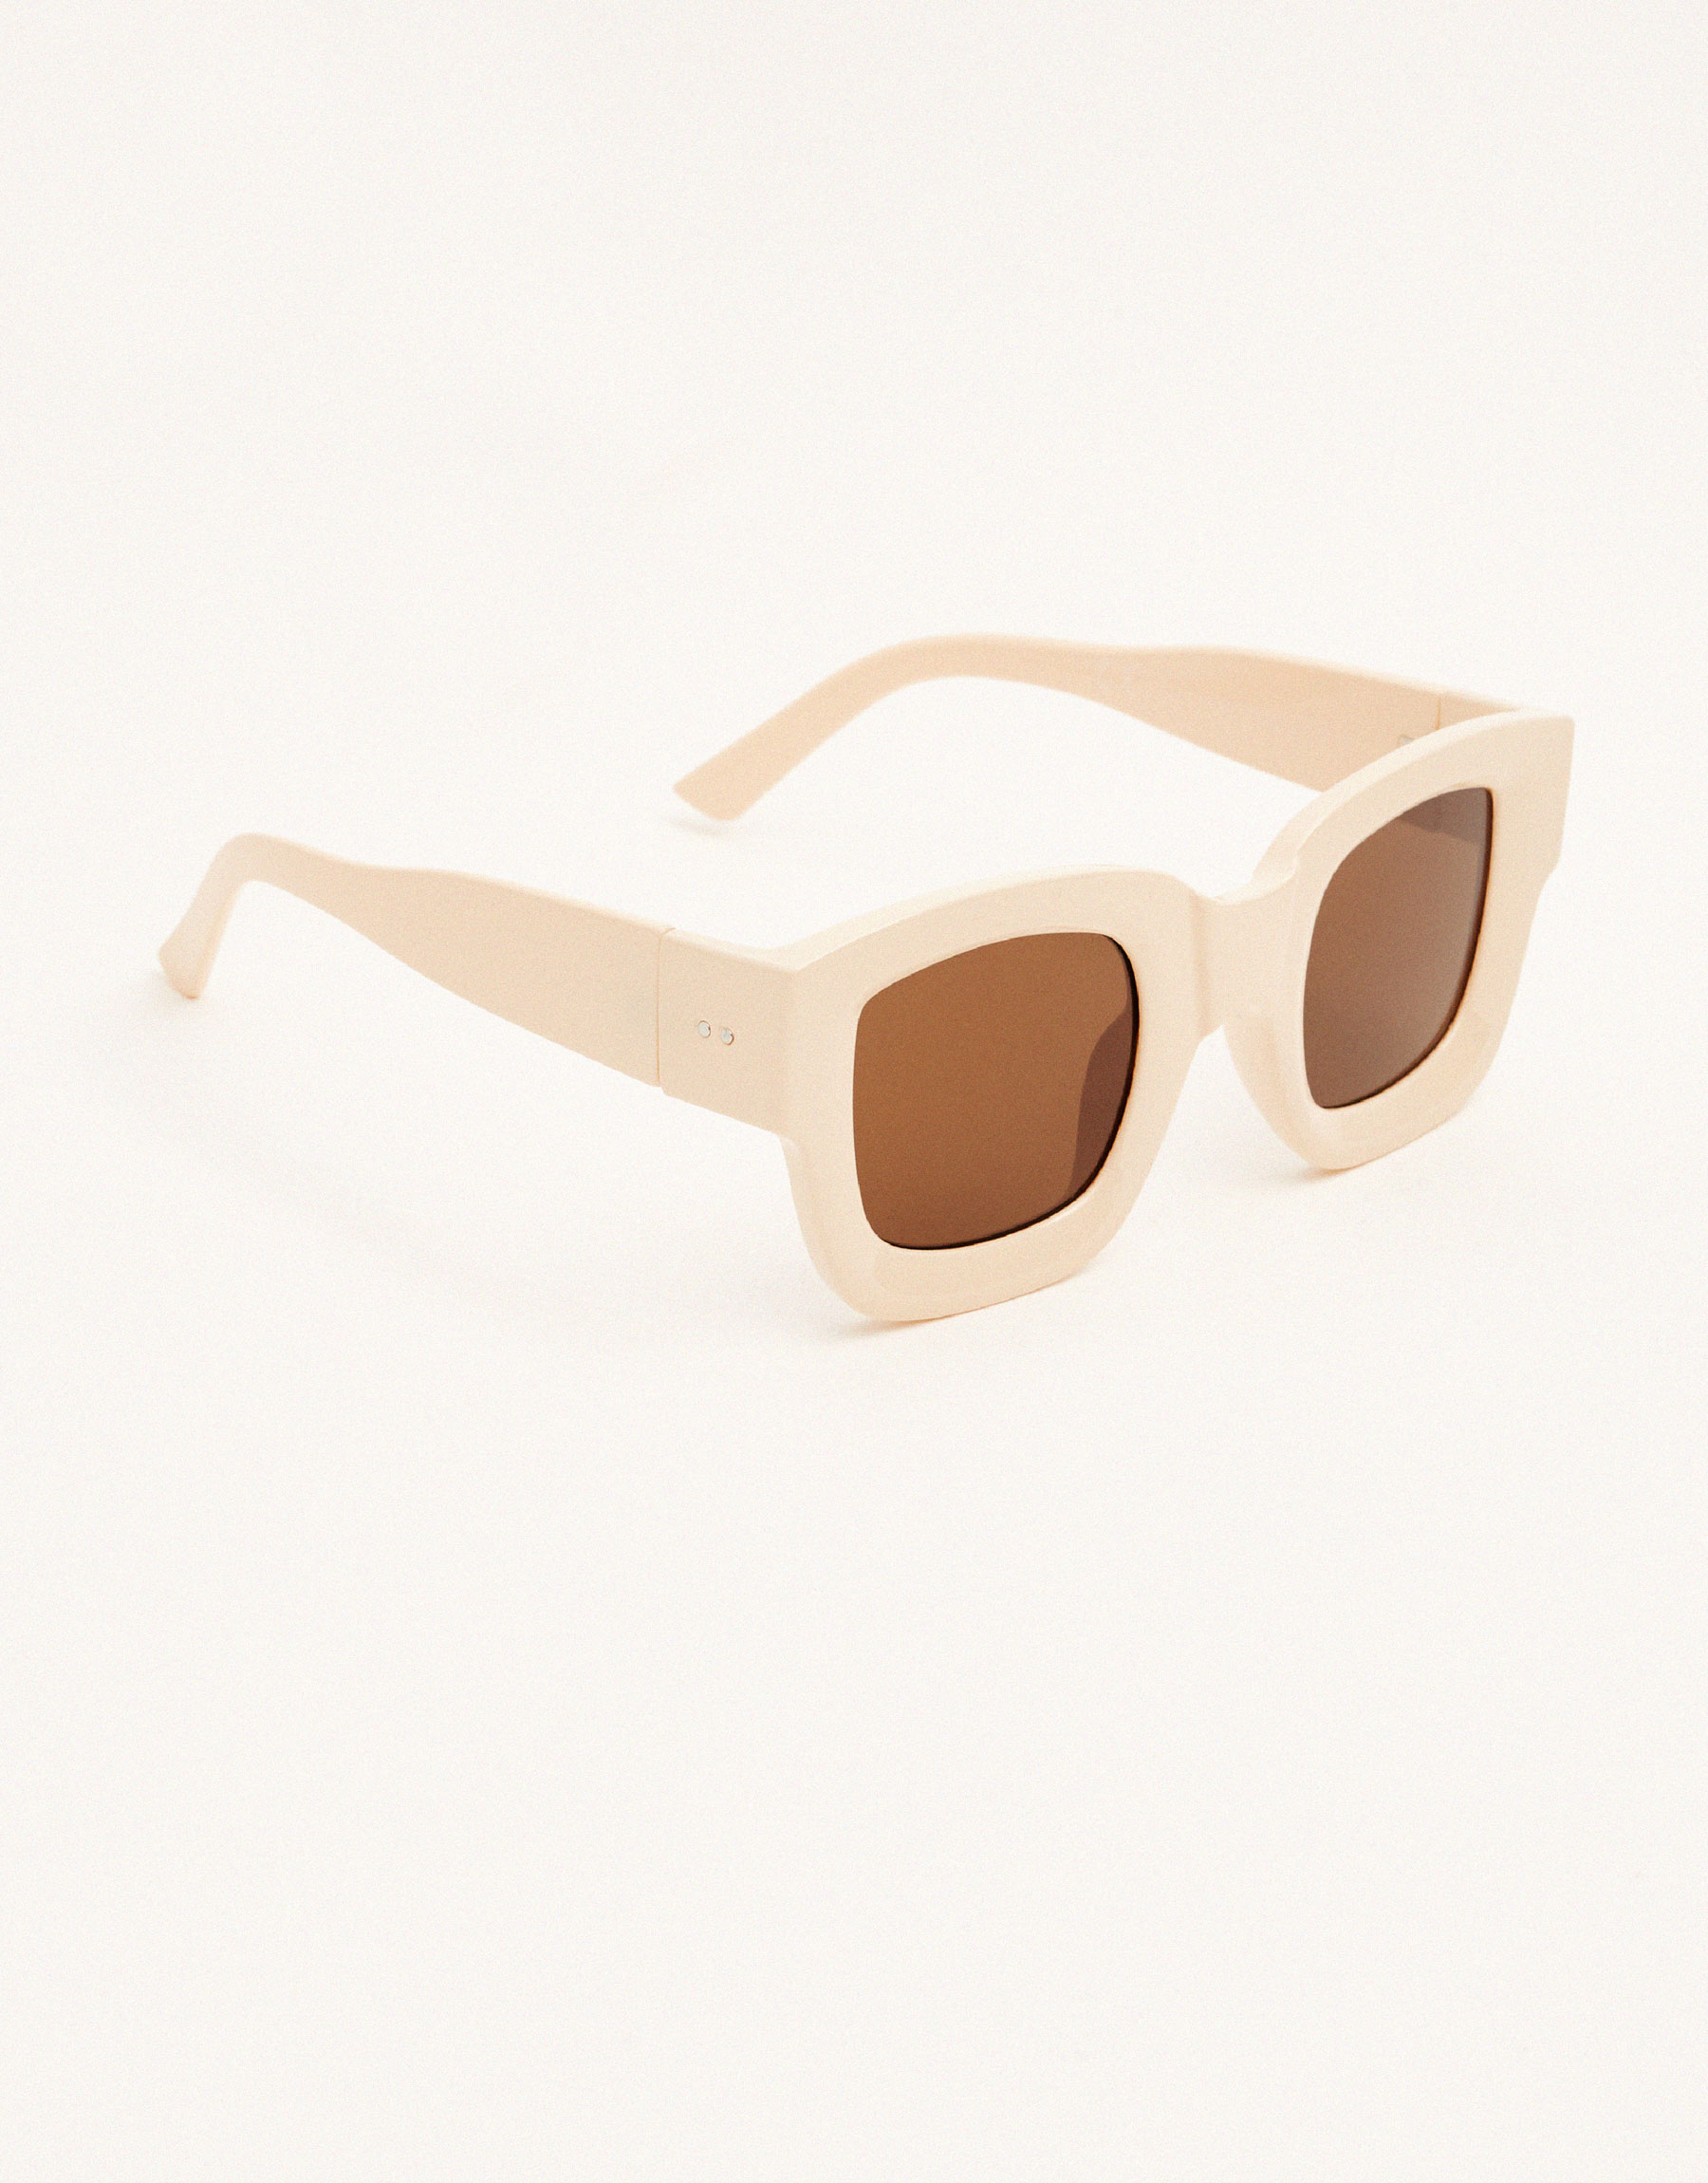 Слънчеви очила Pull and Bear 20 лв.